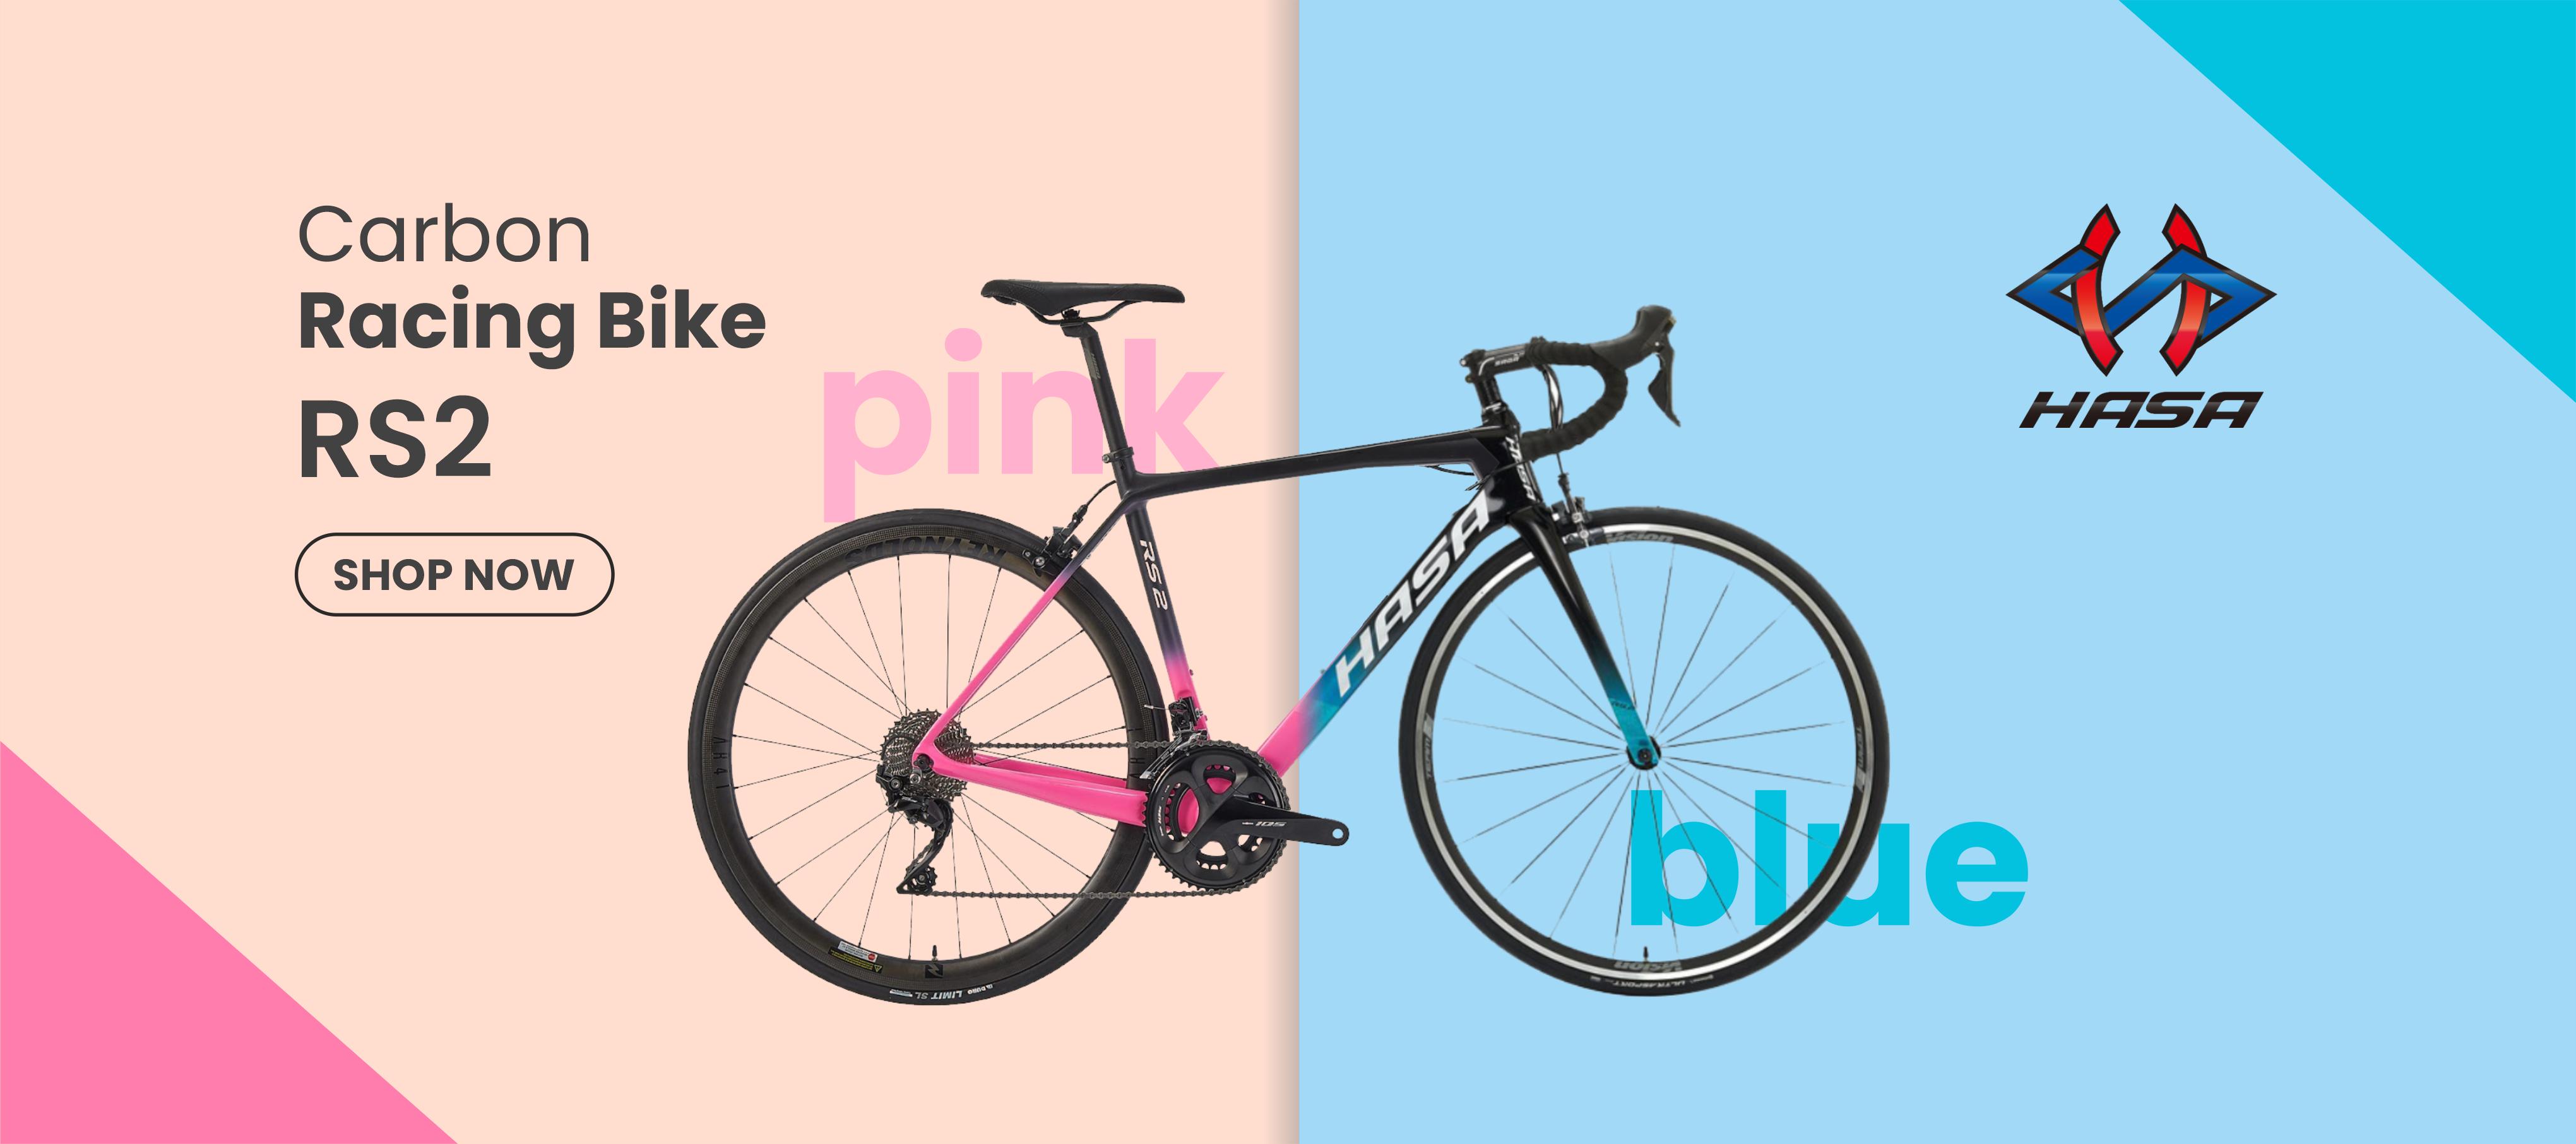 Dubai Bicycles